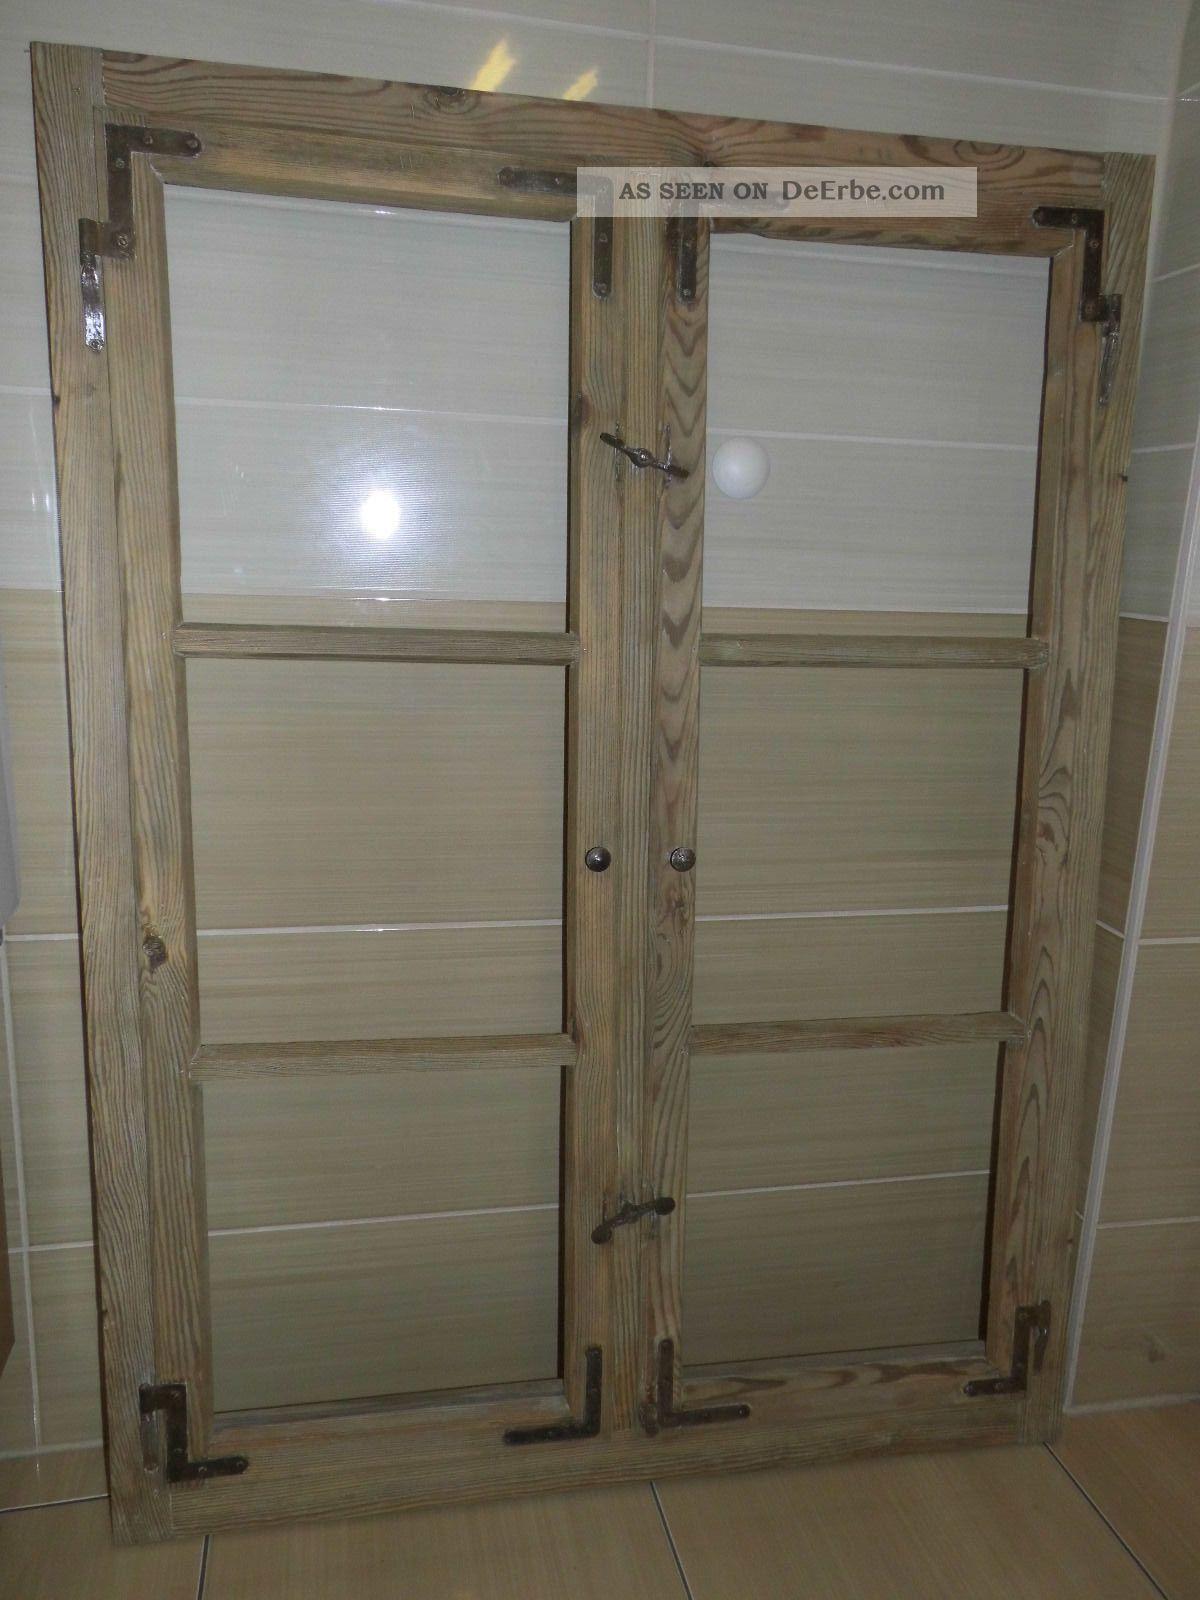 Alte holzfenster deko deko fenster holz fensterbeschl ge for Gartendeko altes fenster